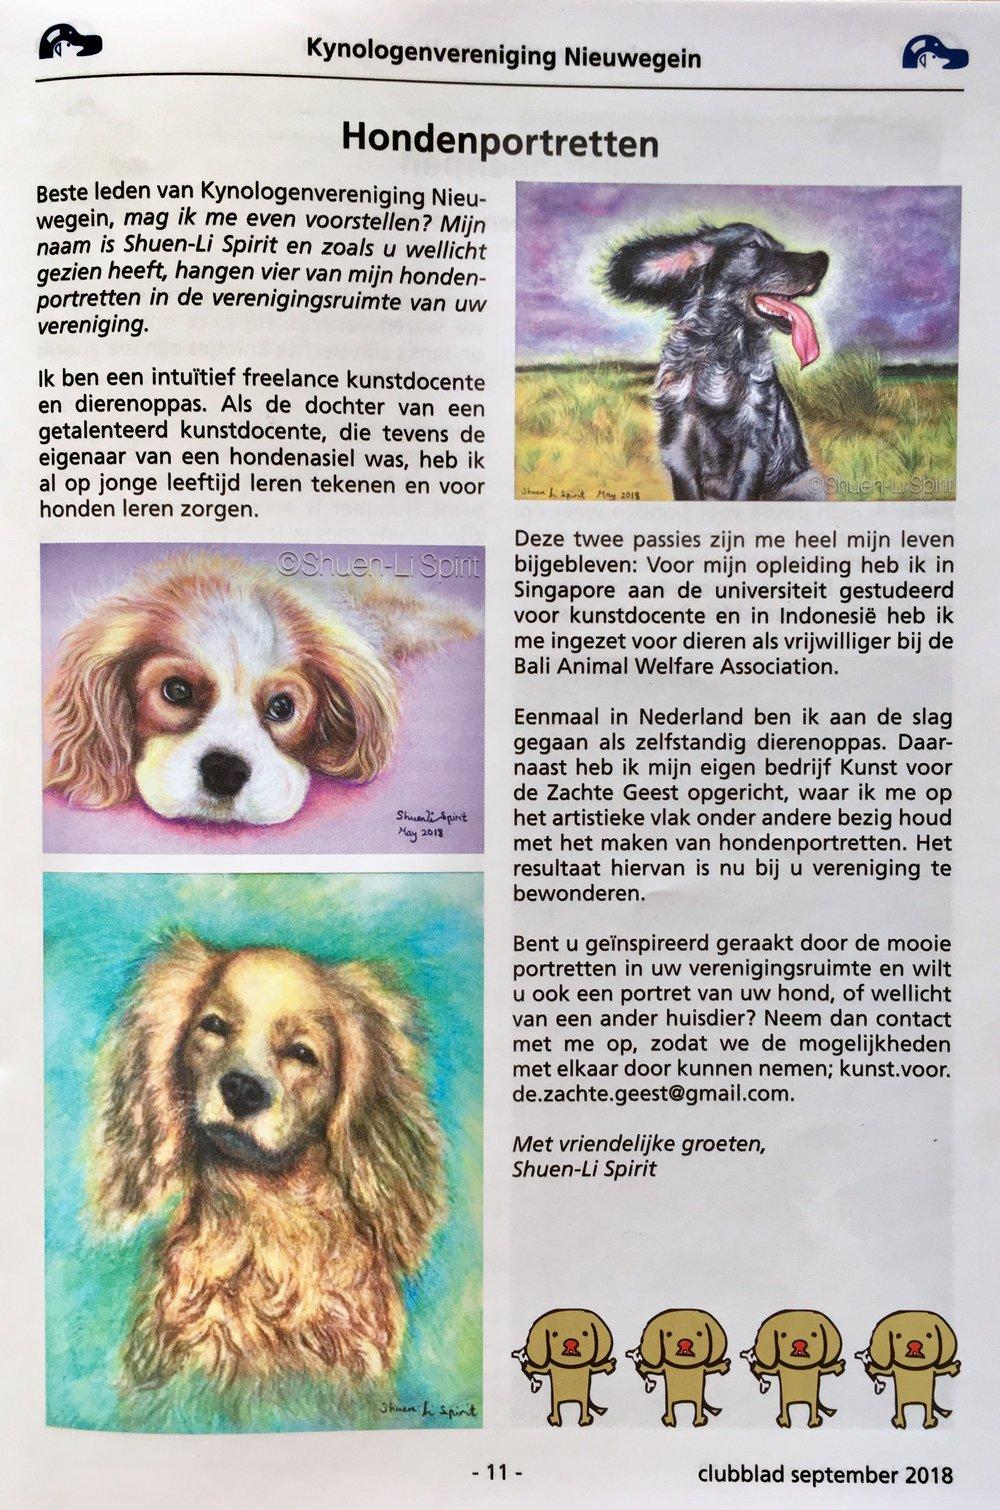 Kynologenvereniging Nieuwegein    Clubblad September 2018, jaargang 34, nummer 3